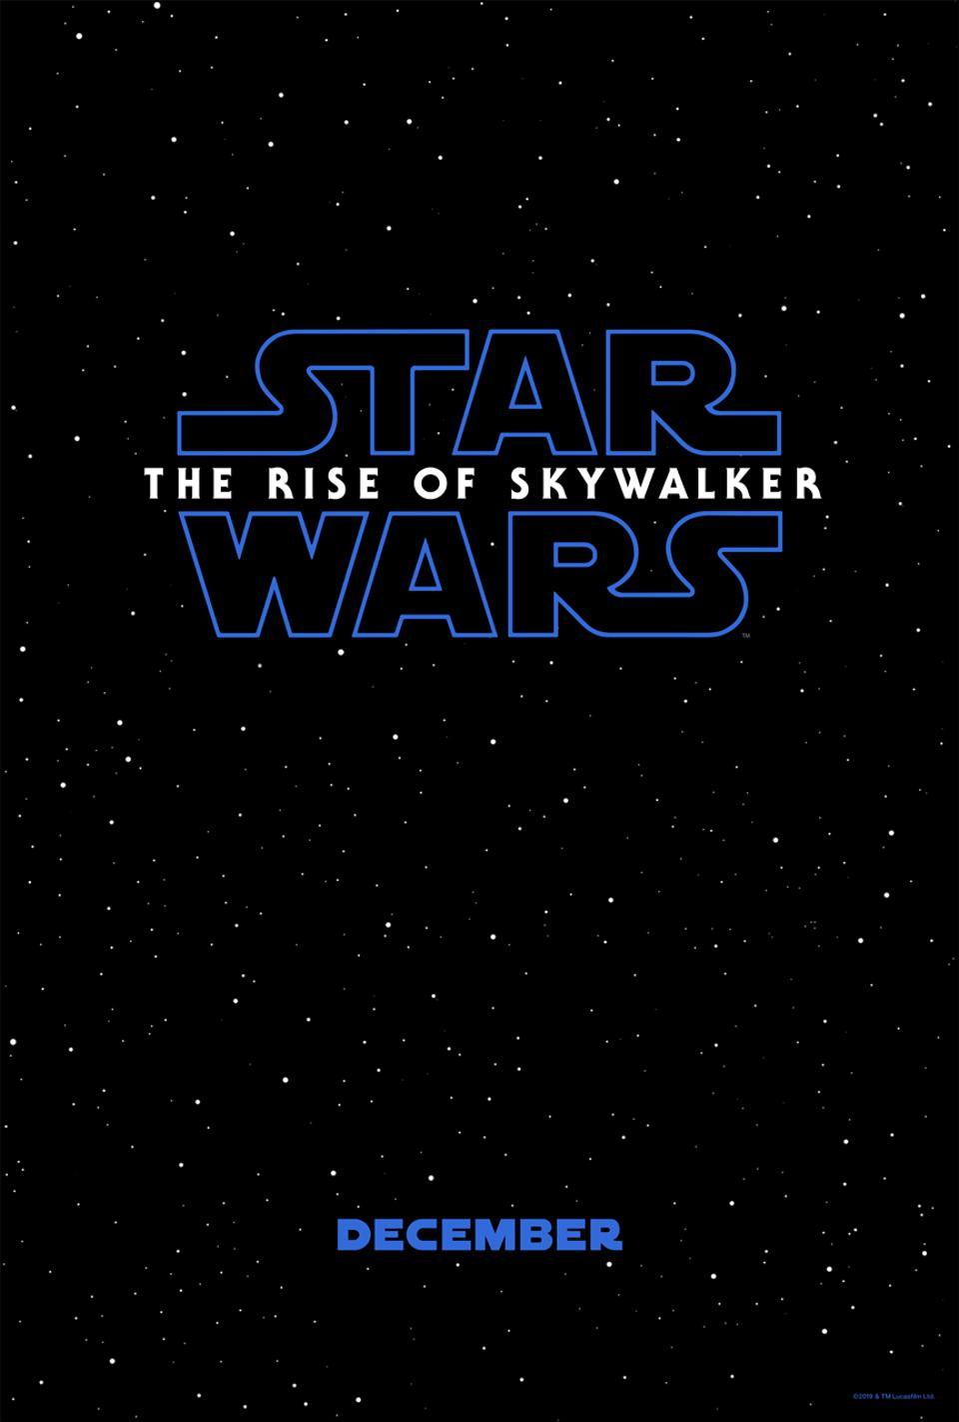 Official teaser poster for Lucasfilm's ″Star Wars: The Rise of Skywalker″